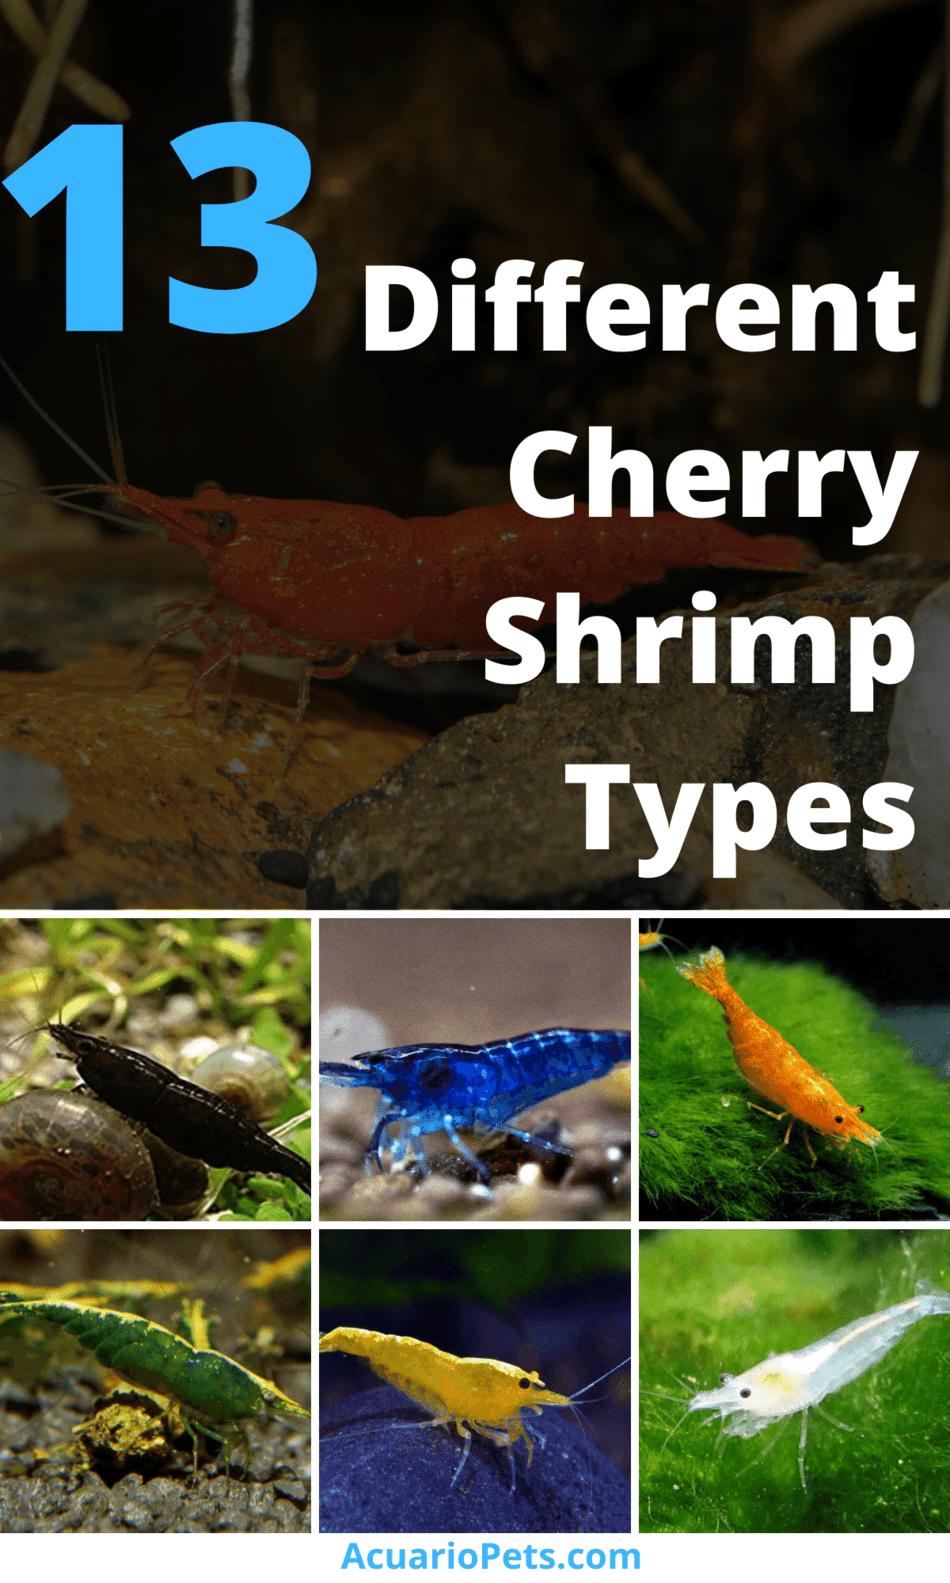 13 Different Cherry Shrimp Types